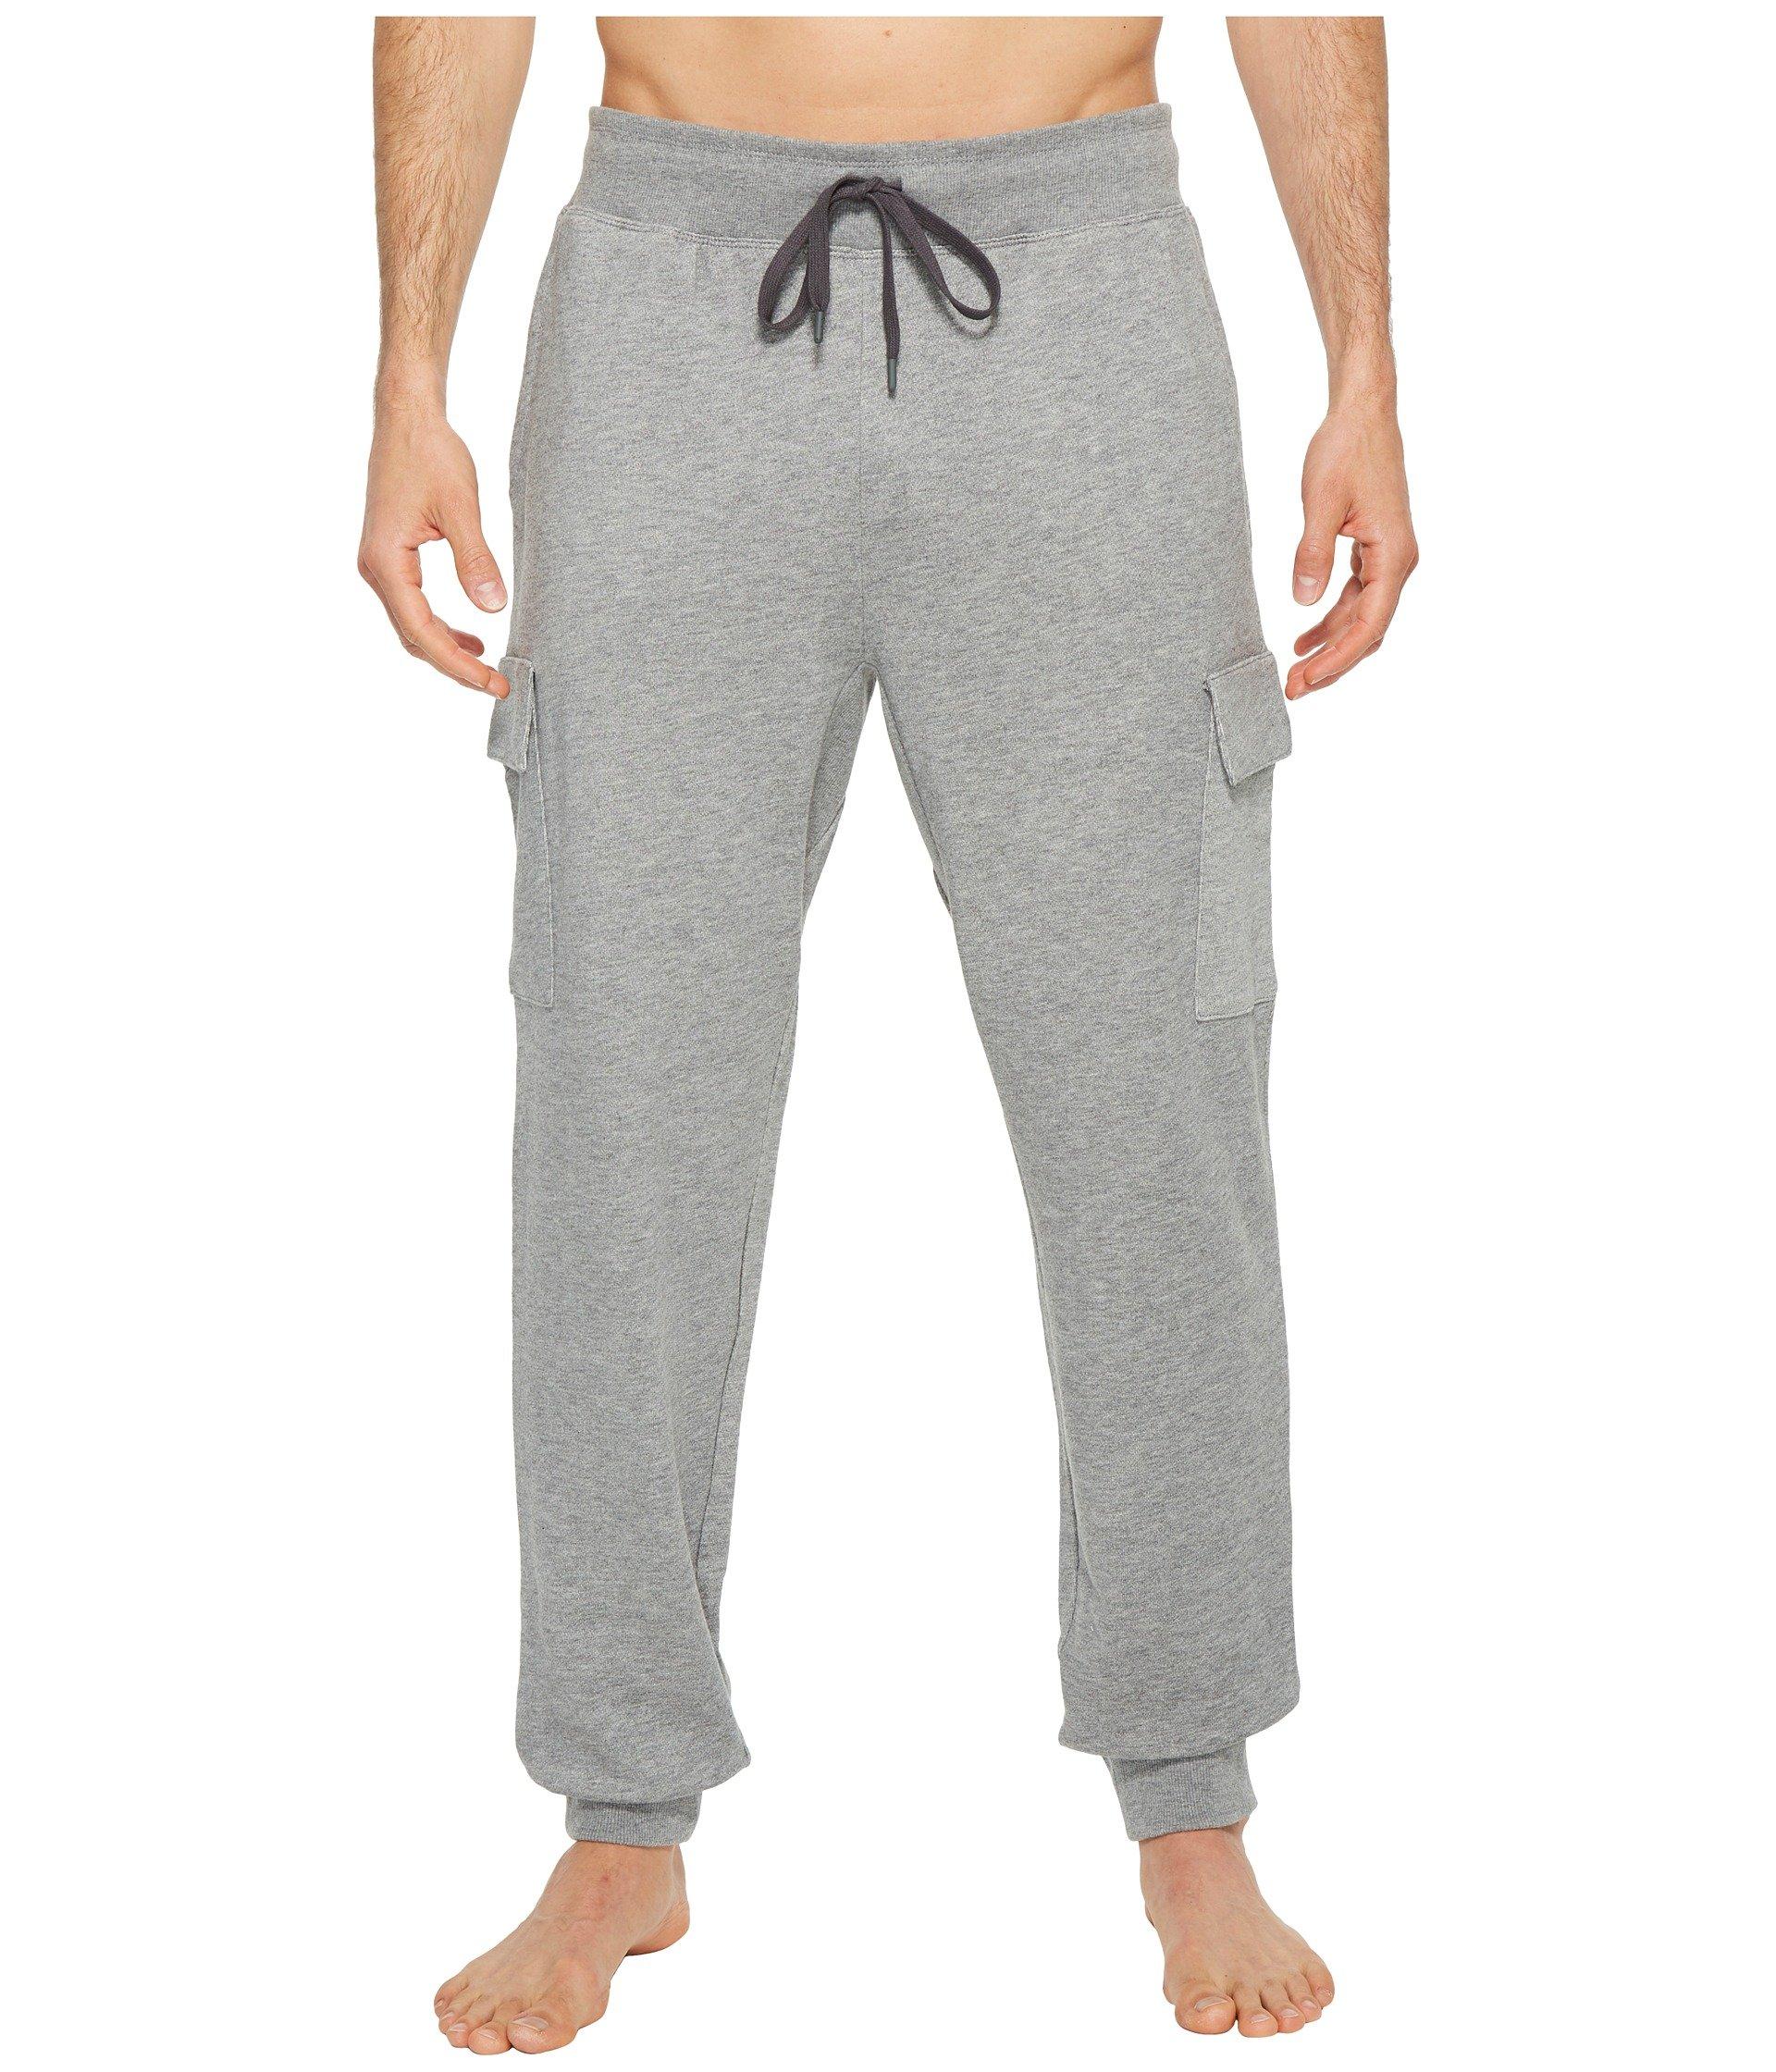 Pantalón de Pijama para Hombre 2(X)IST Core Bottoms Cargo Sweatpants  +  2(X)IST en VeoyCompro.net